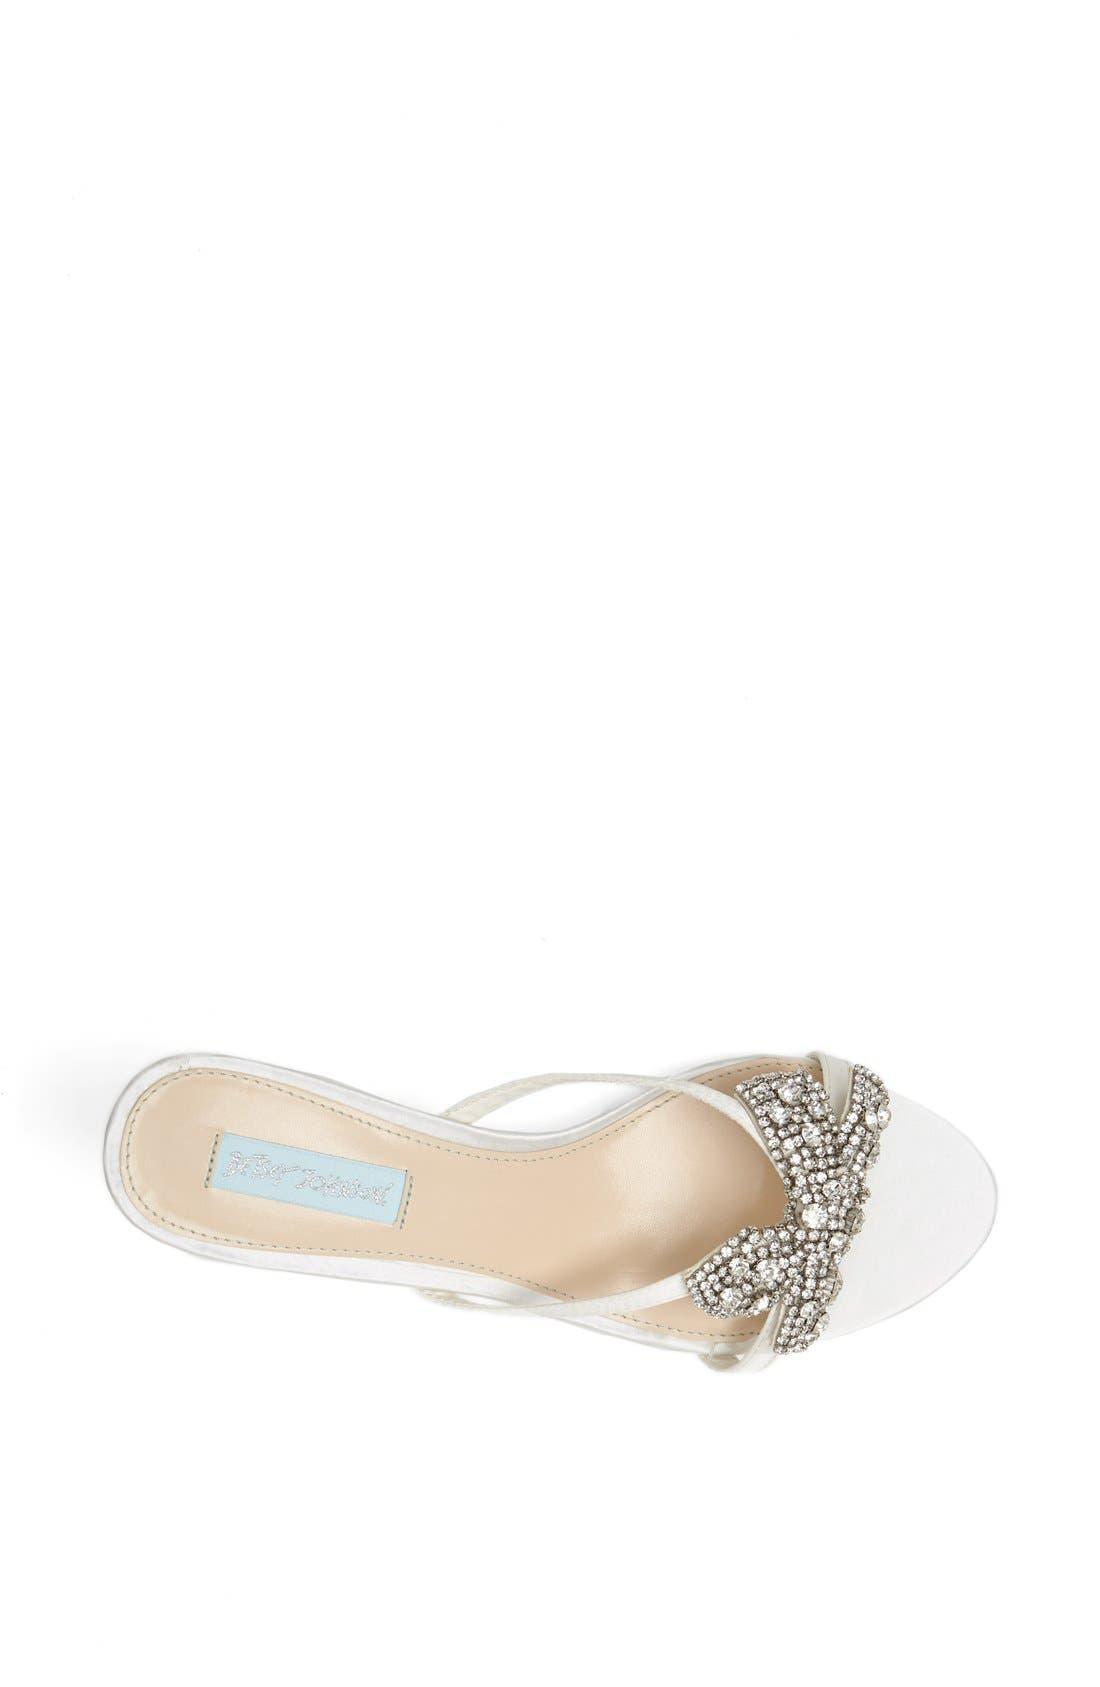 Alternate Image 3  - Betsey Johnson 'Blush' Sandal